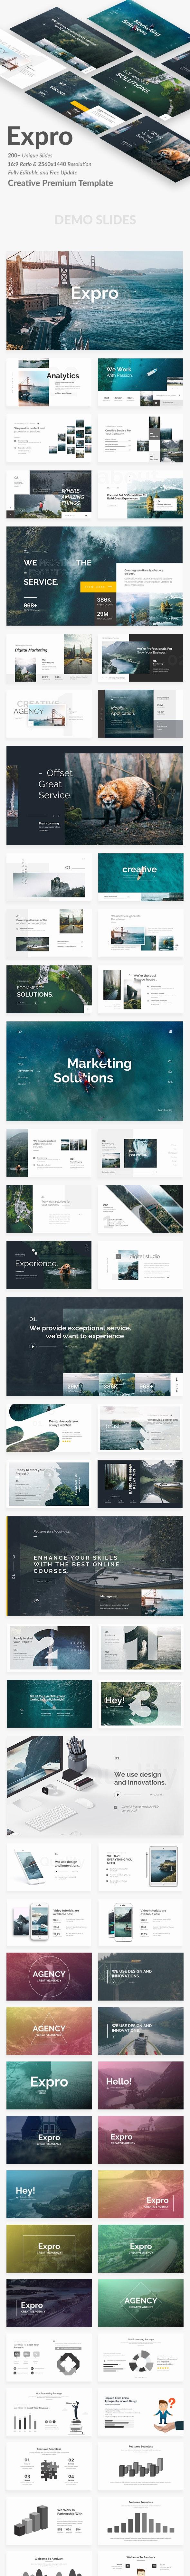 Expro Creative Design Google Slide Template - Google Slides Presentation Templates